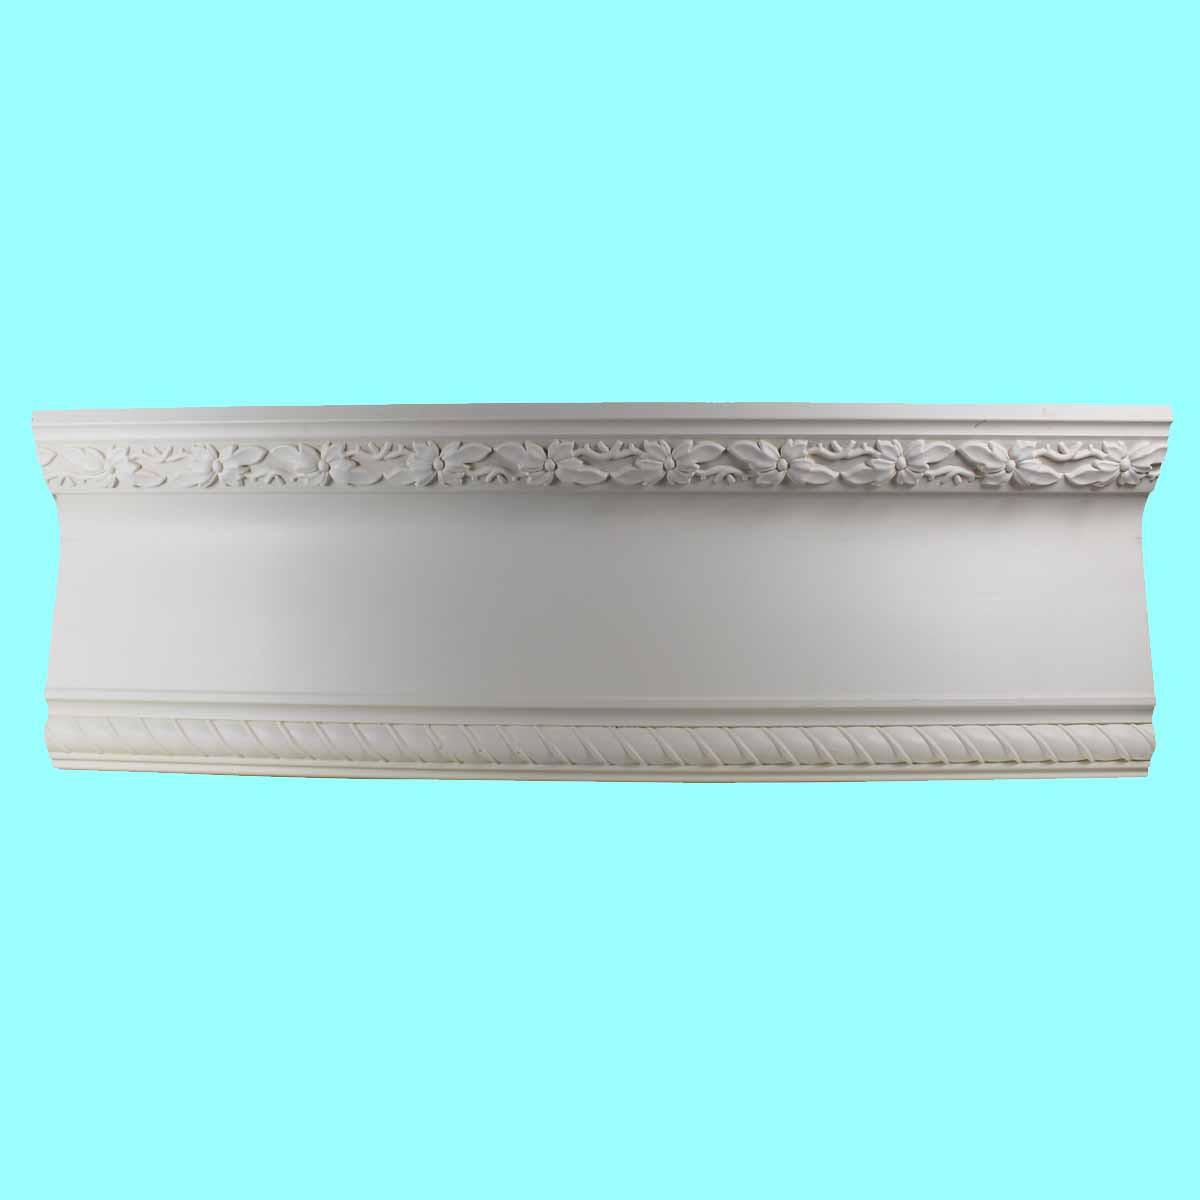 Cornice White Urethane Sample of 10990 23.5 Long Cornice Cornice Moulding Cornice Molding